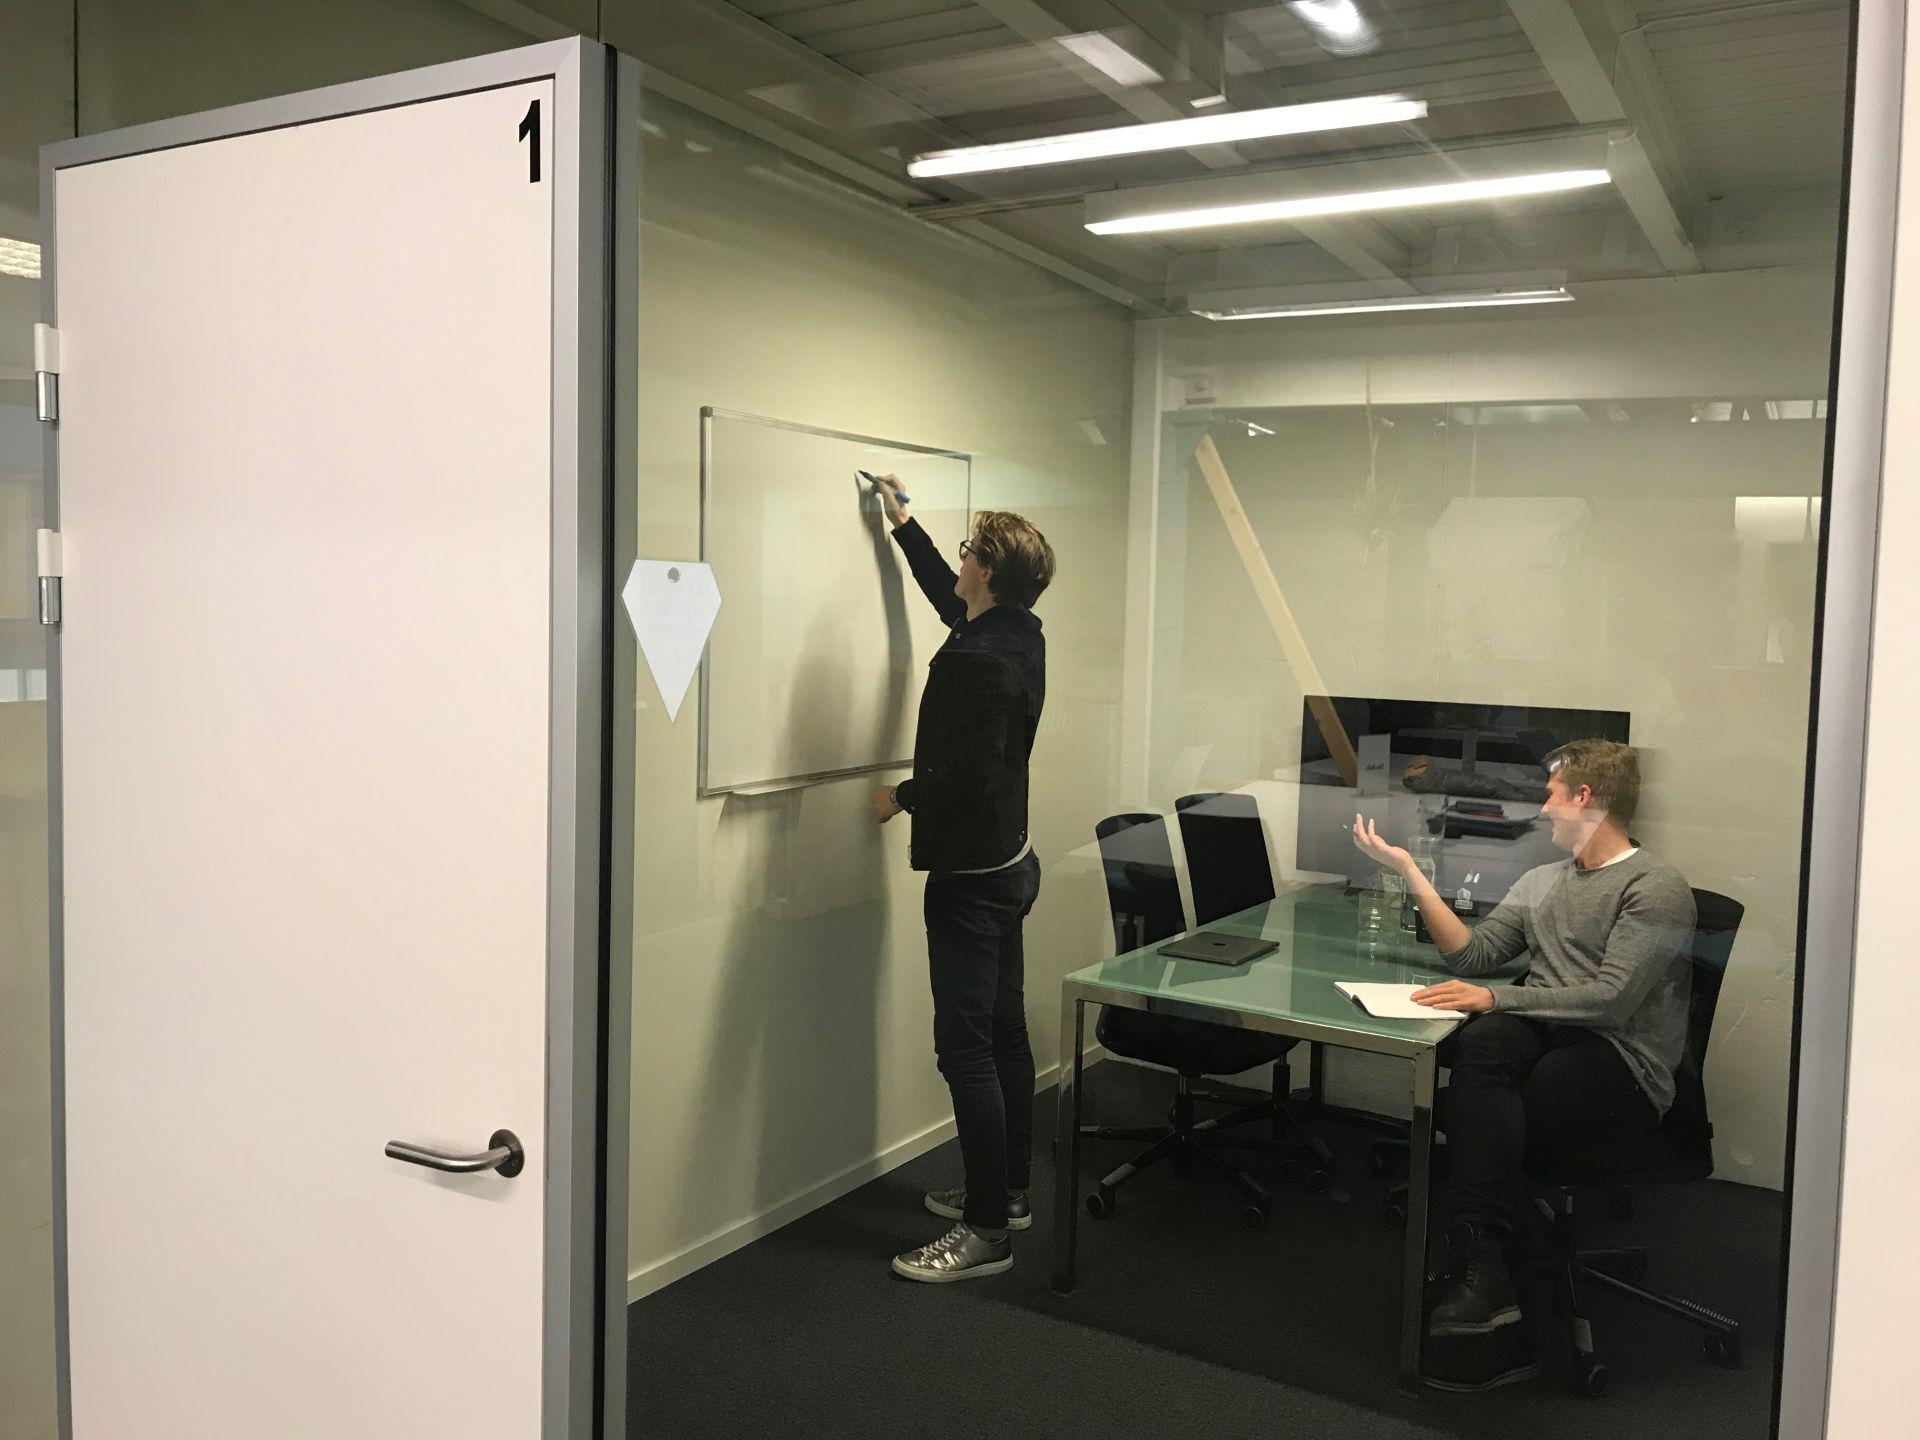 Oslo House of Innovation, Oslo